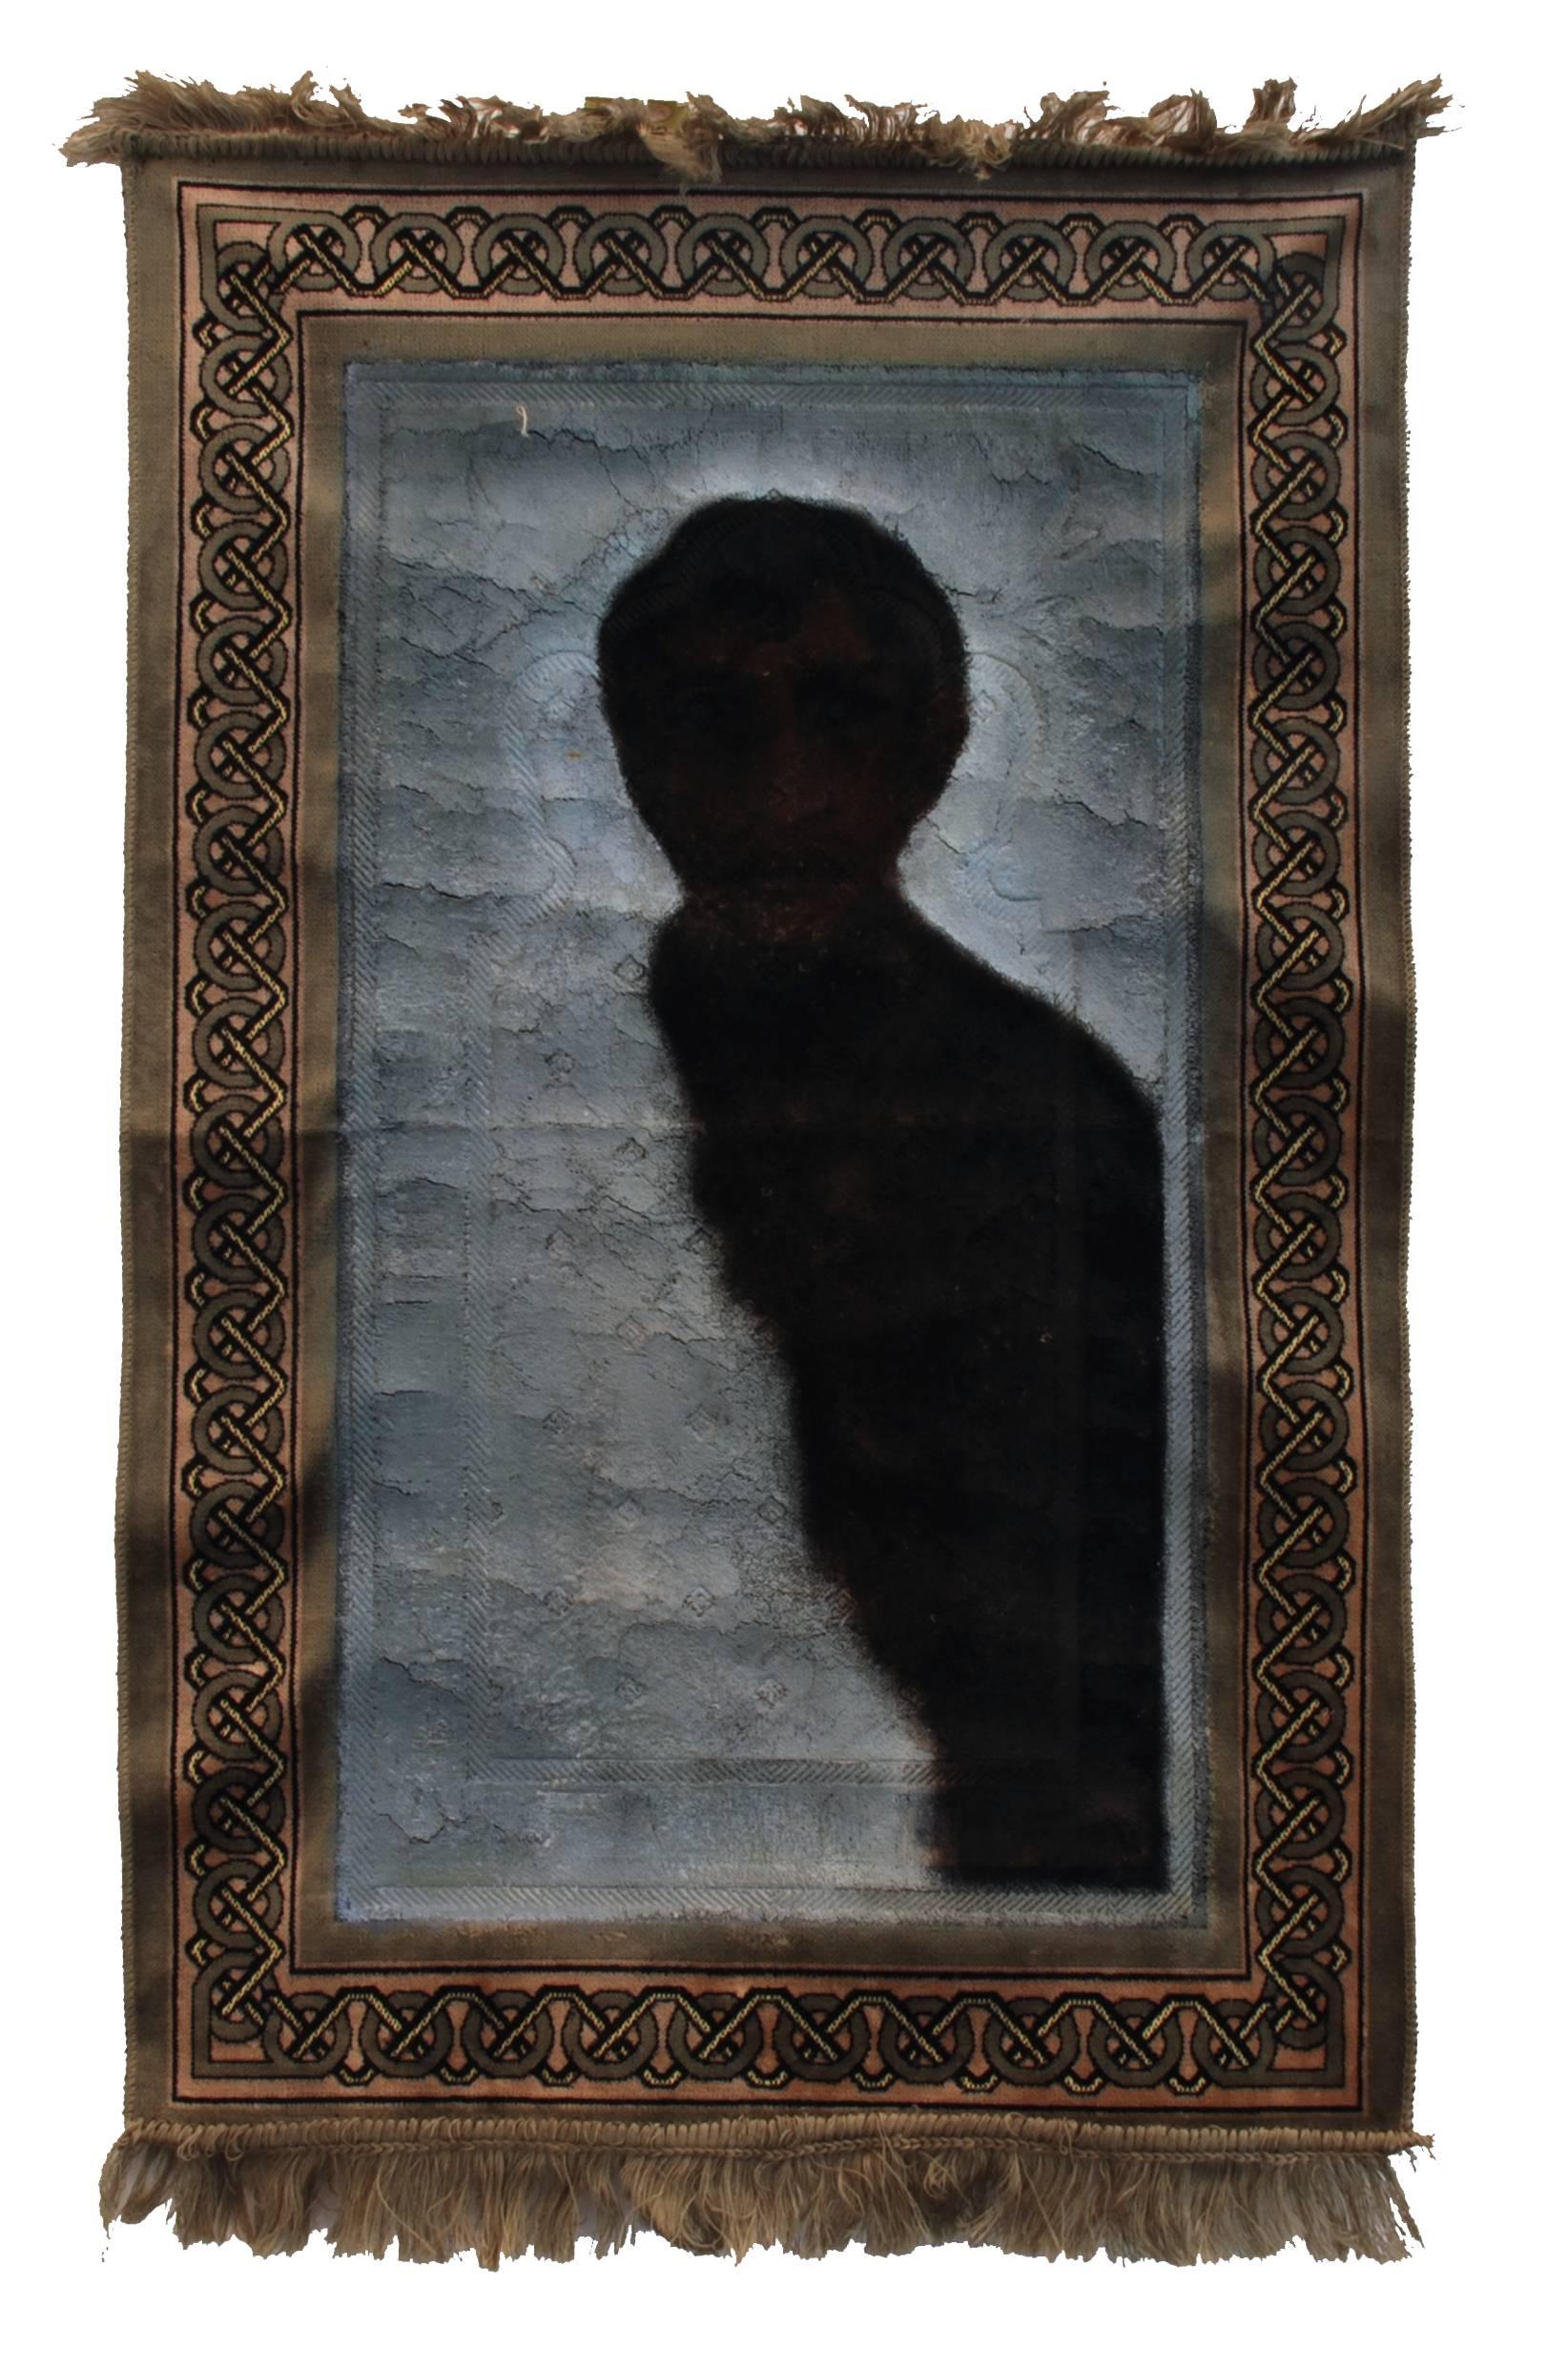 KY2008026x Kamel Yahiaoui – The Prayer of the Absent, 2003, 95 x 147 cm, mixed media on carpet,